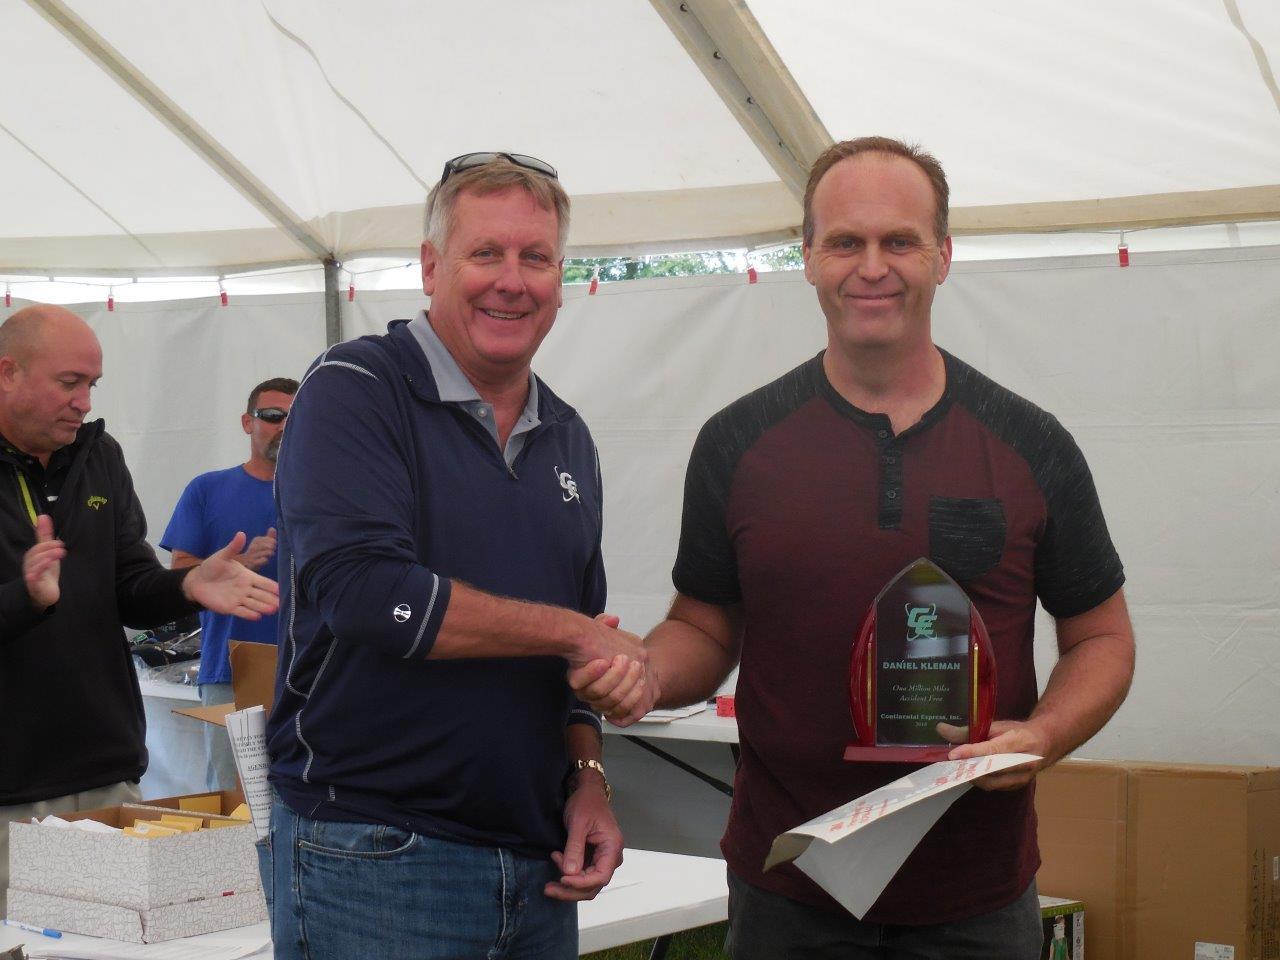 Previous Continental Express Million Mile Award Recipient - Driver Appreciation Picnic 2019